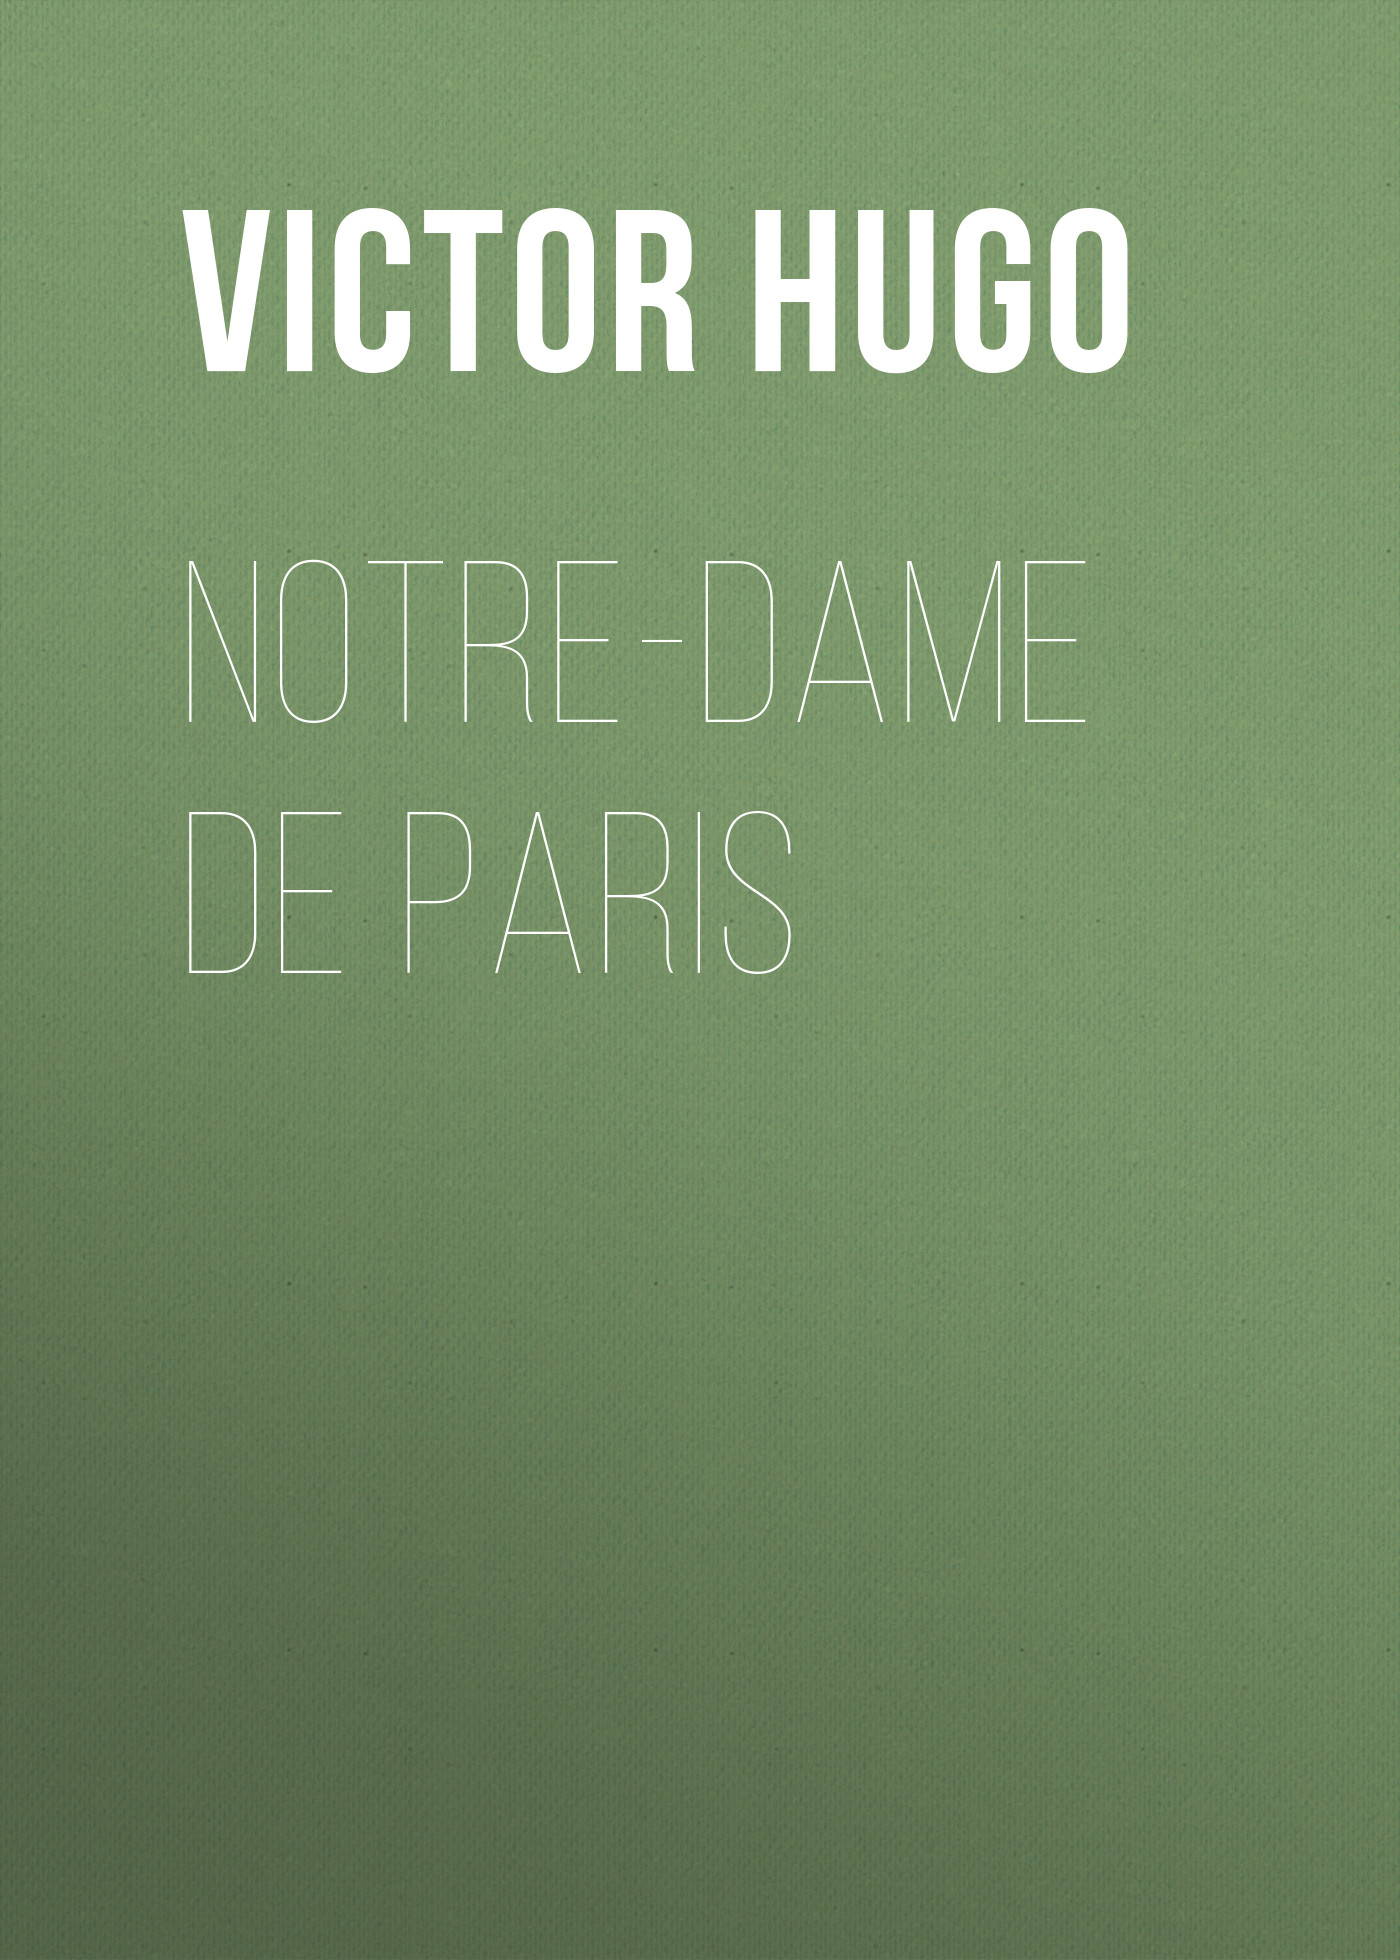 Виктор Мари Гюго Notre-Dame De Paris hugo victor the hunchback of notre dame